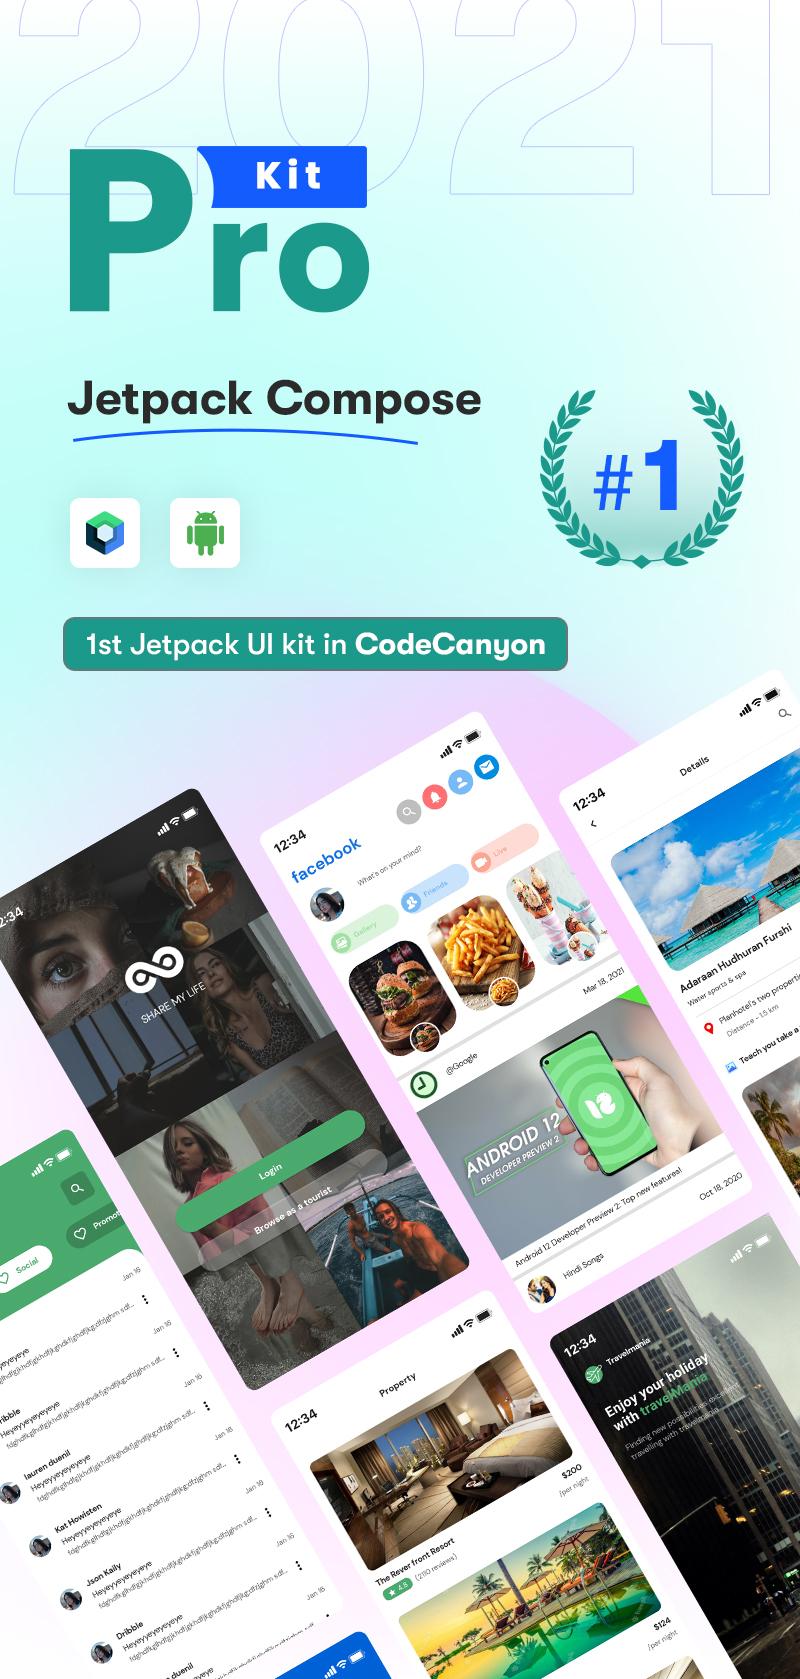 Android Jetpack Compose UI Kit | Prokit | Iqonic Design android jetpack compose ui kit Prokit Banner